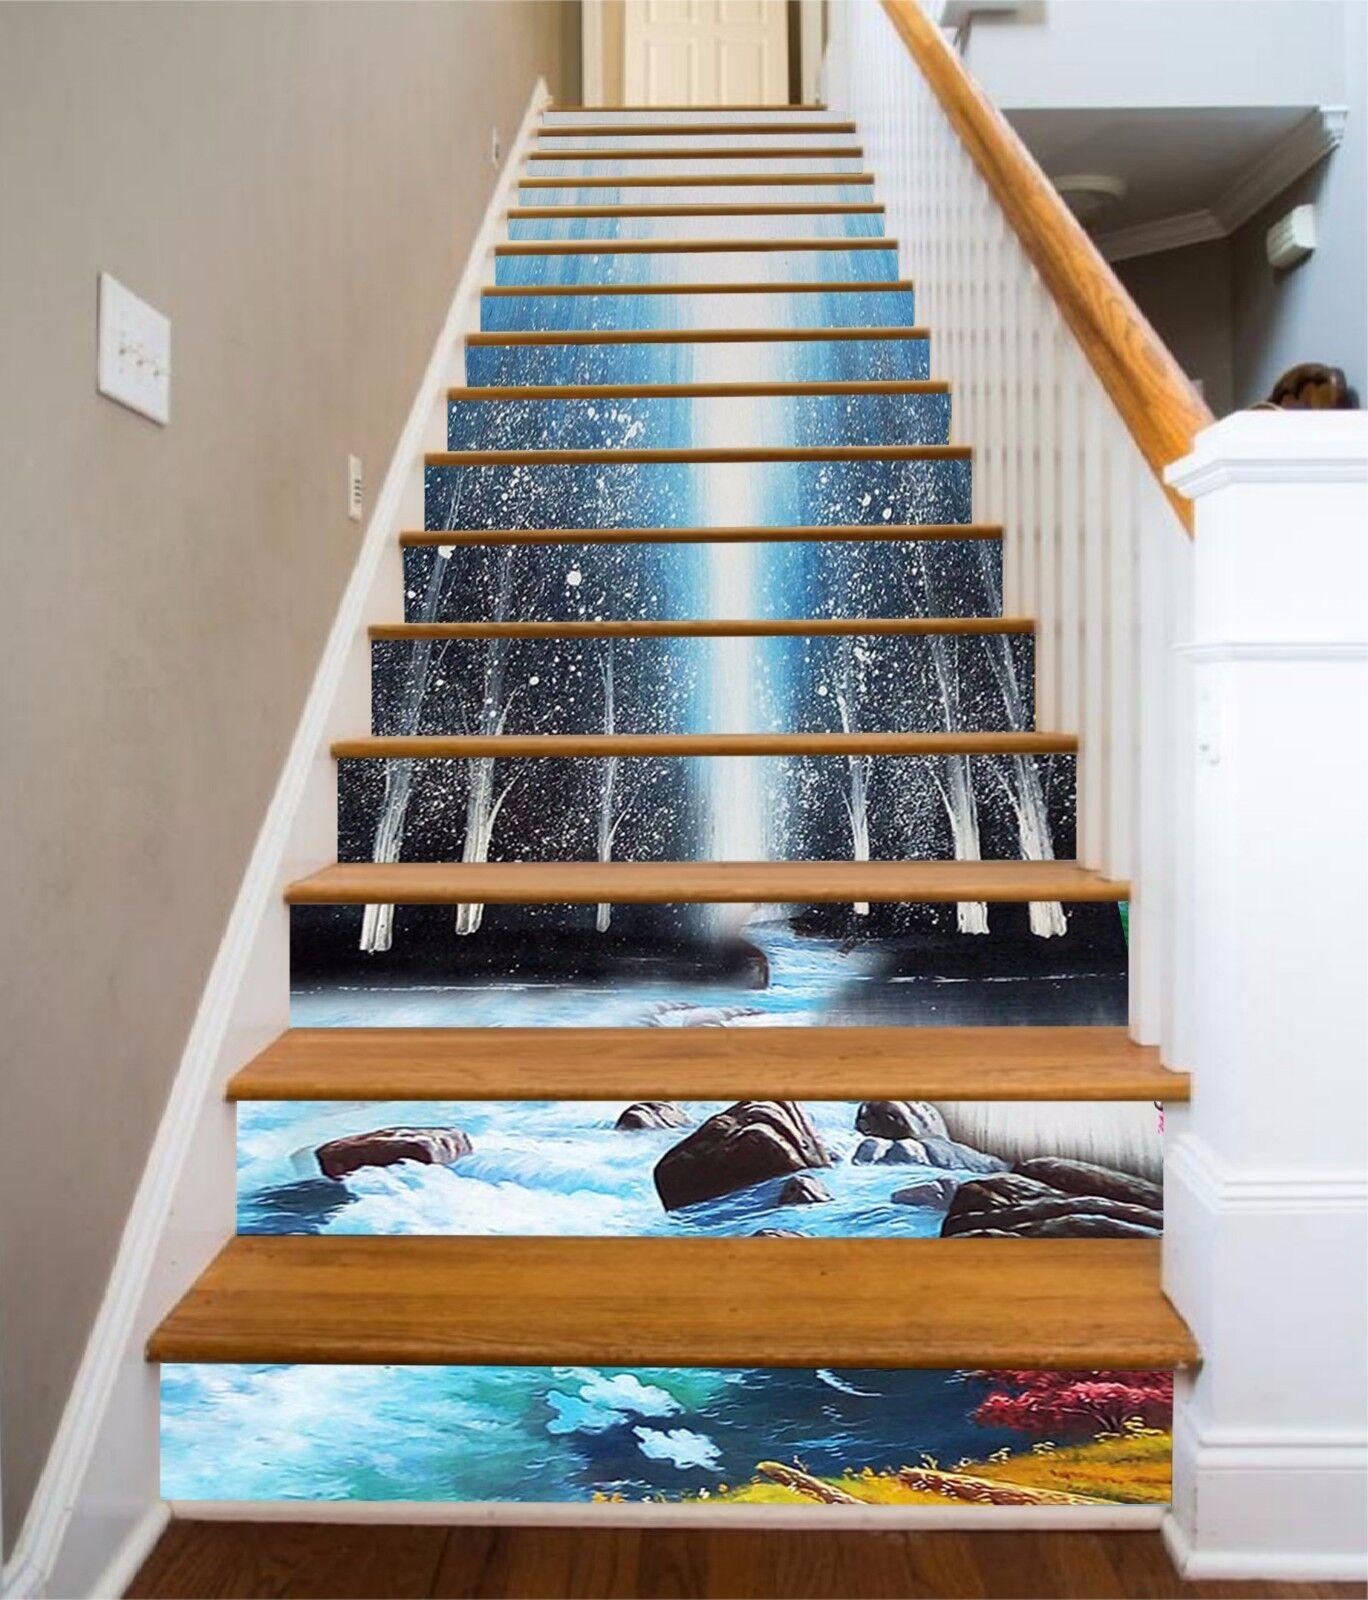 3D River Trees 702 Stair Risers Decoration Photo Mural Vinyl Decal WandPapier AU